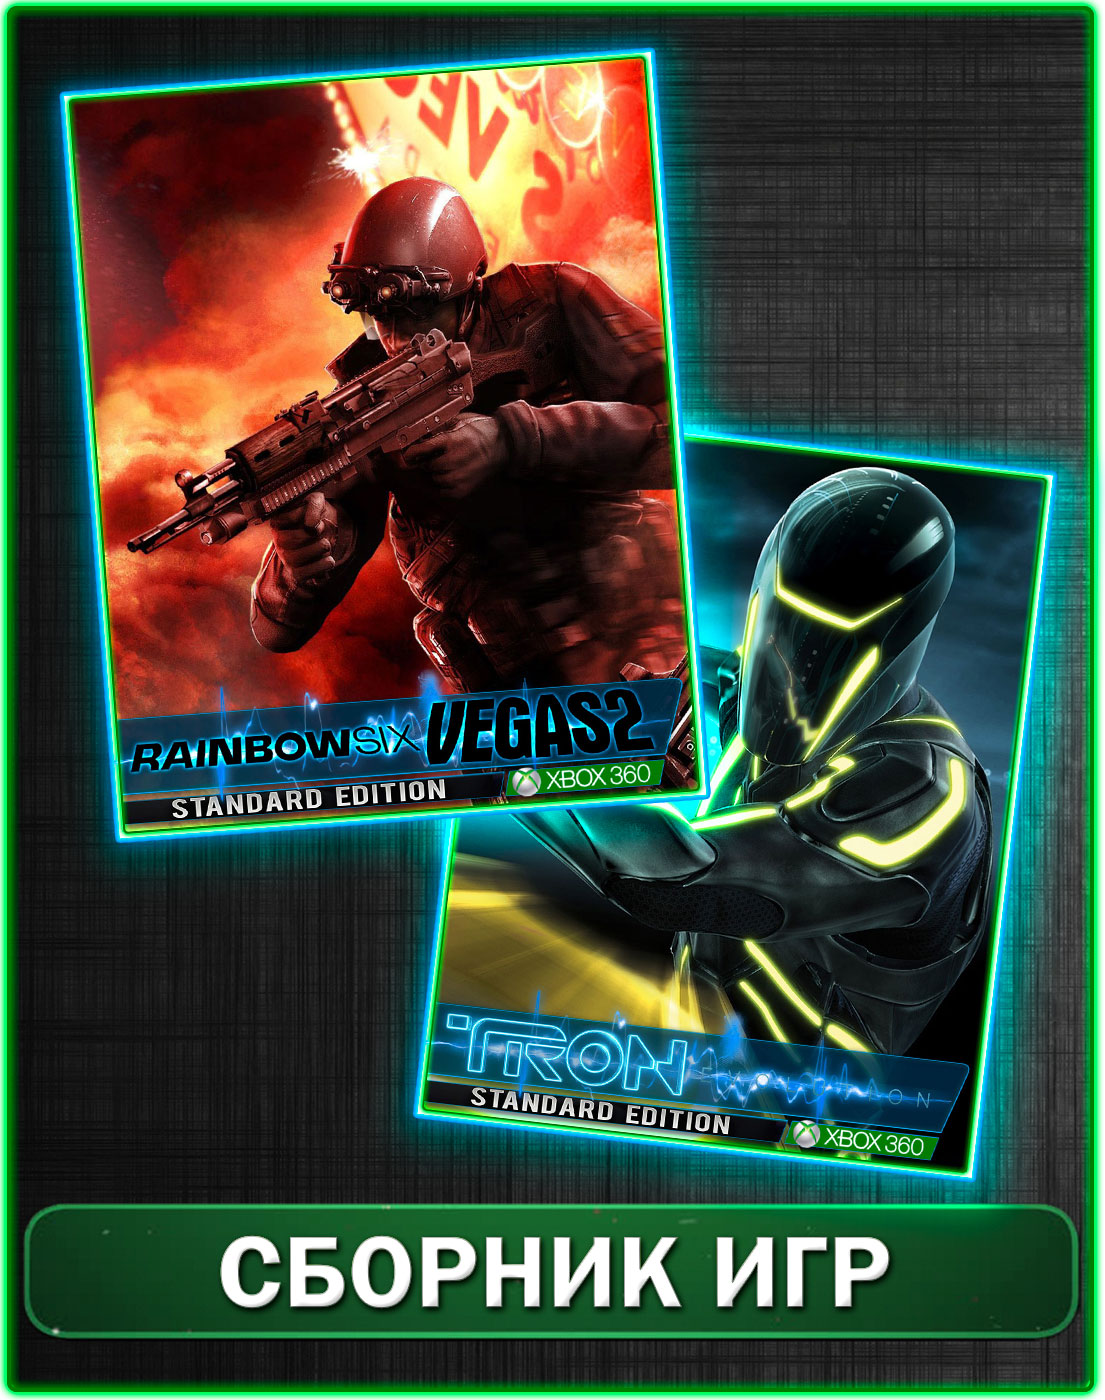 Tron Evolution,Rainbow Six Vegas 2 XBOX 360